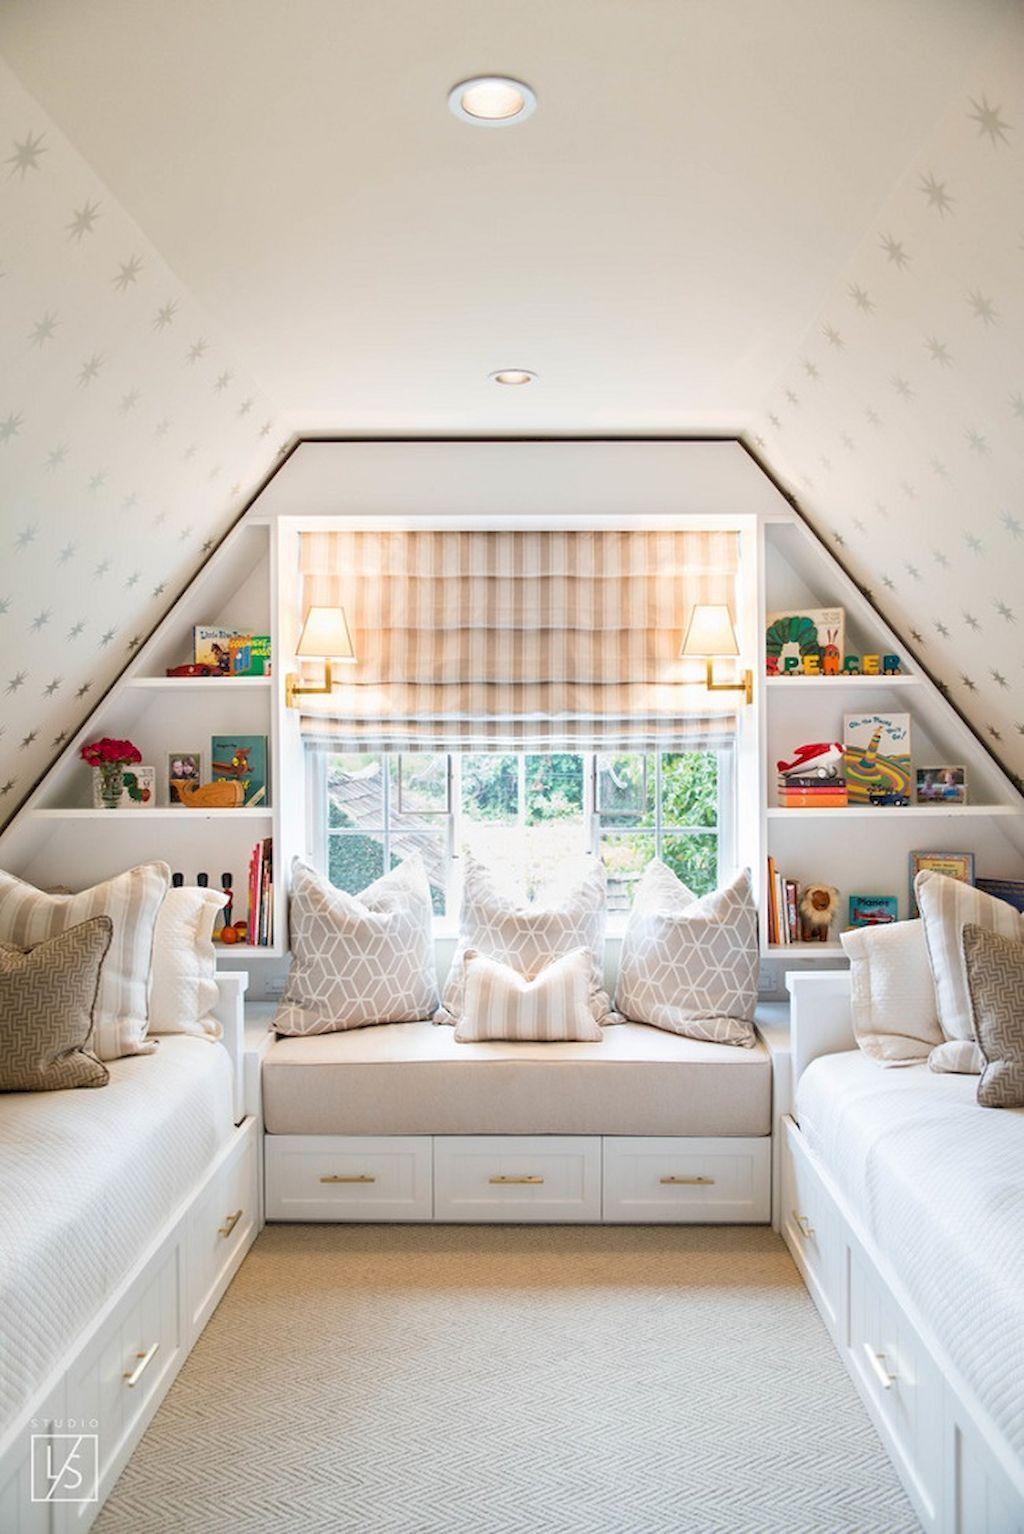 Modern beach bedrooms - Modern Beach Bedrooms 12